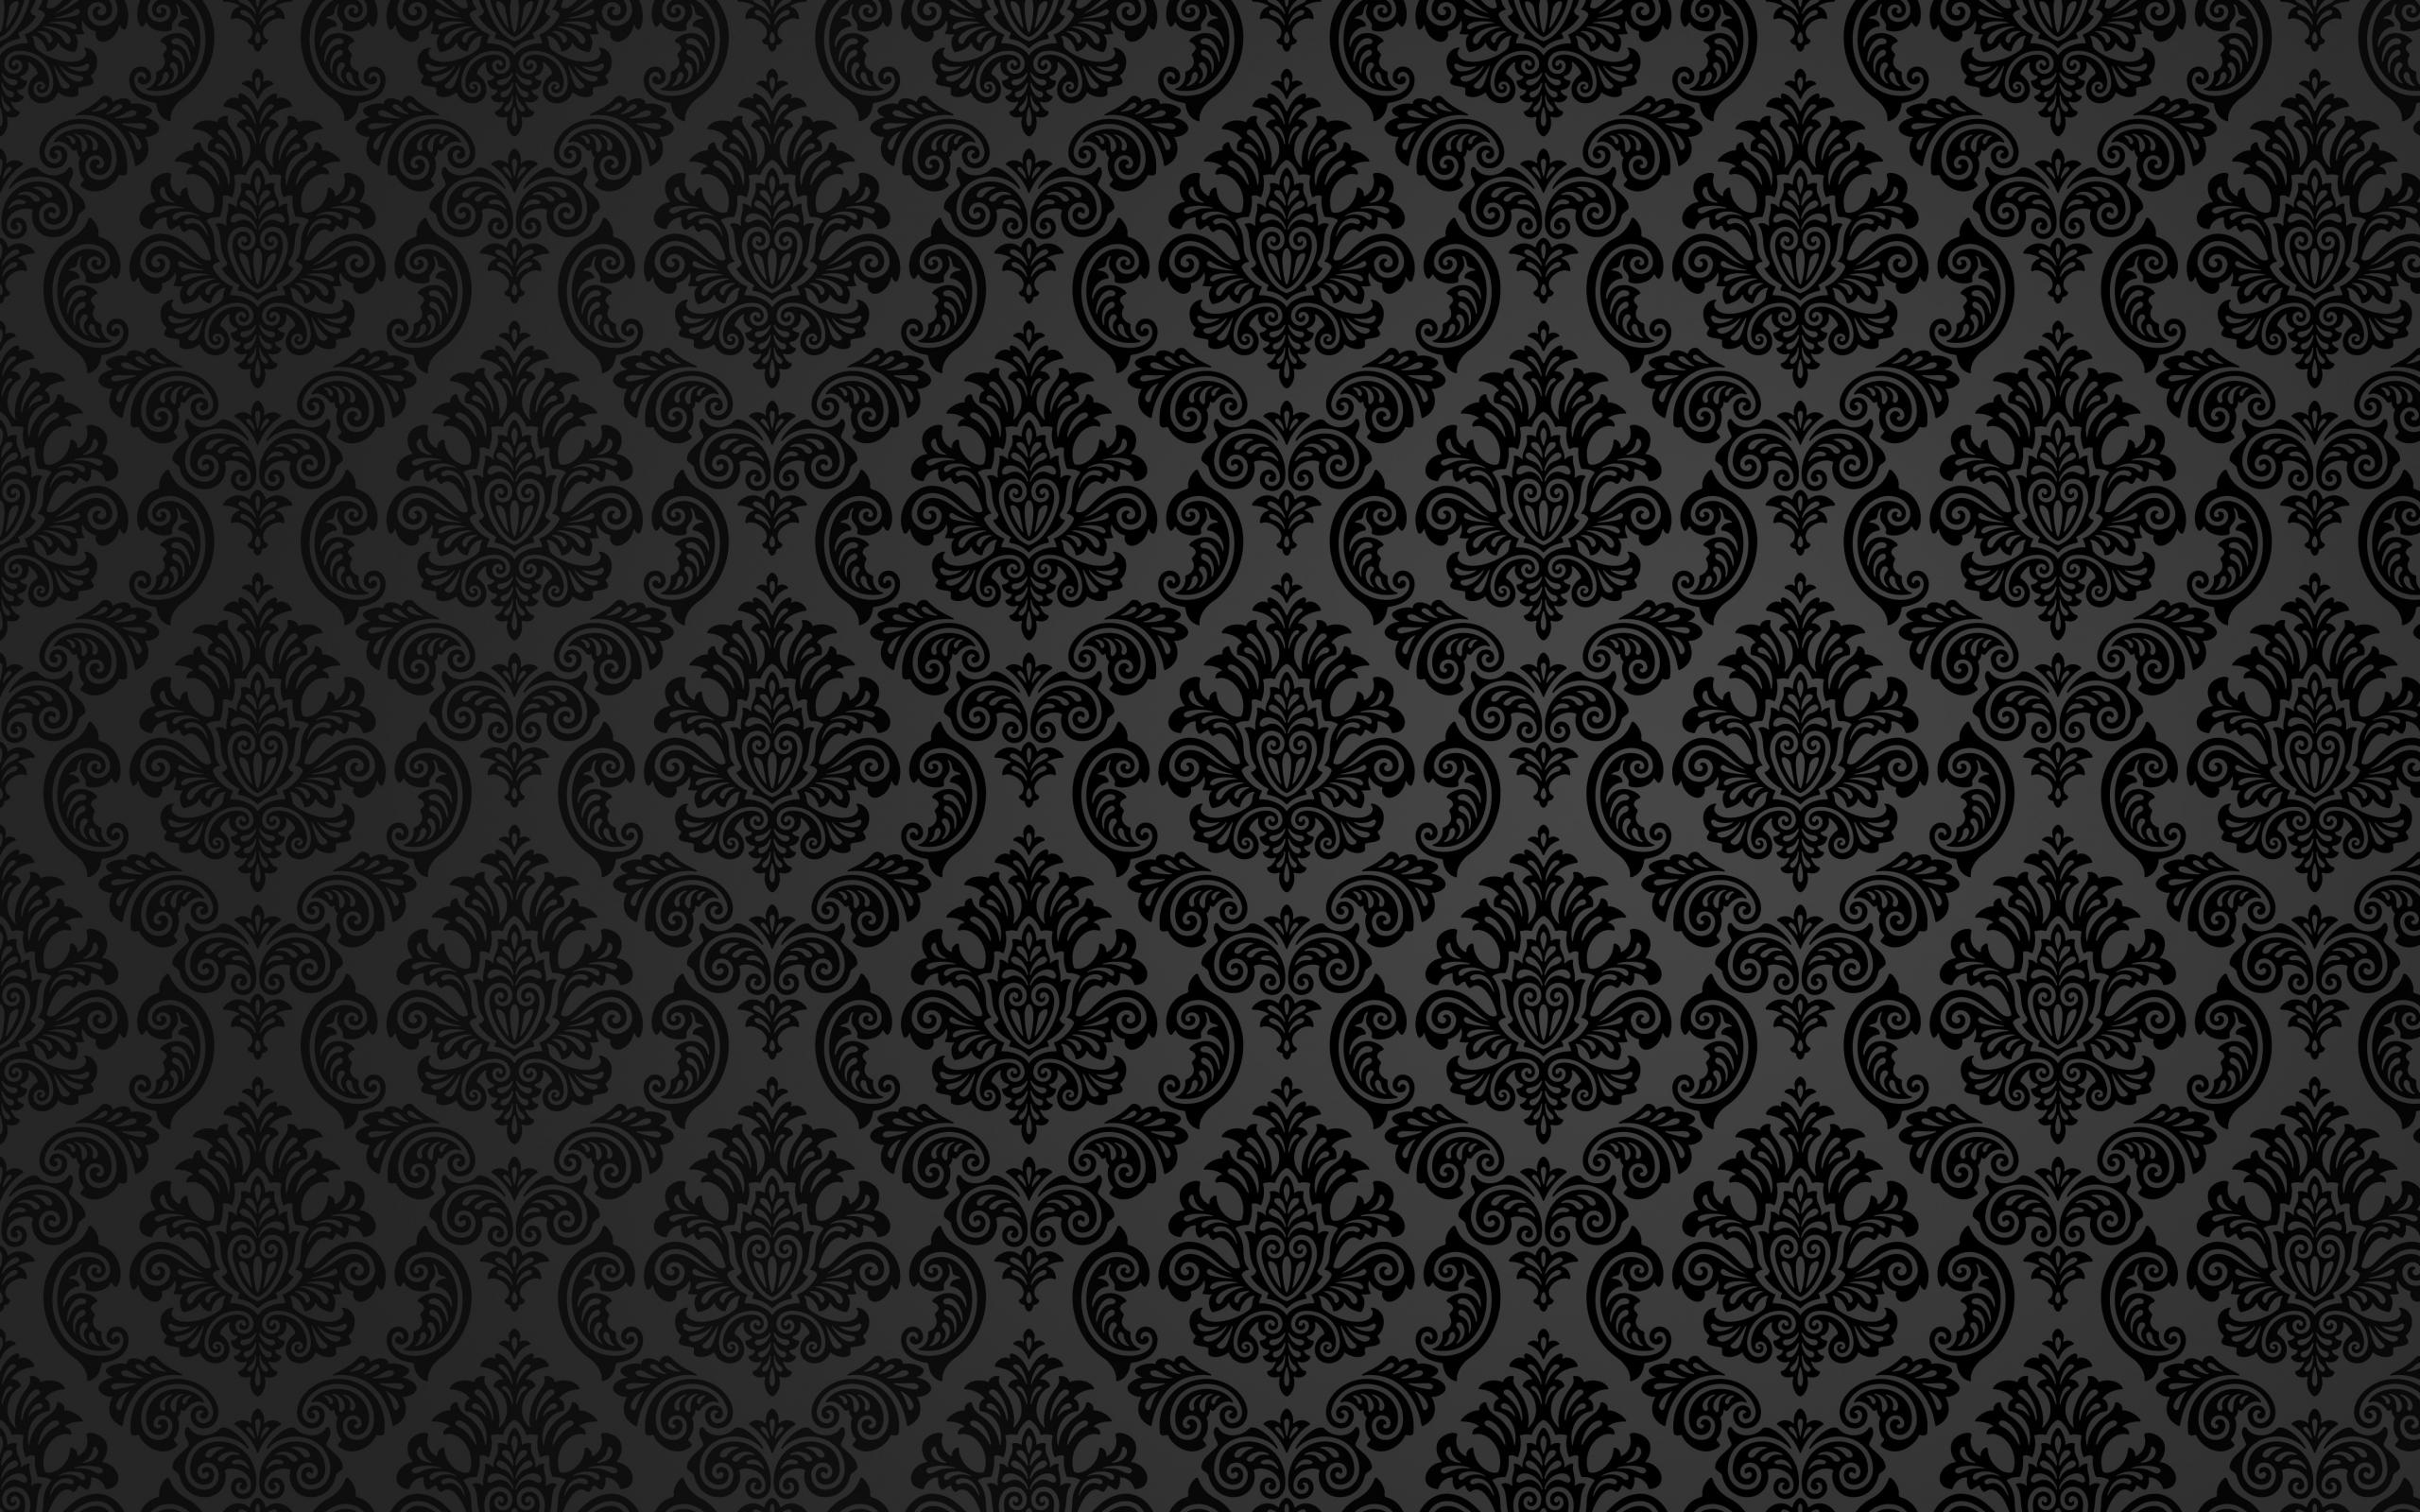 damask patterns wallpapers wallpaper 2560x1600 2560x1600